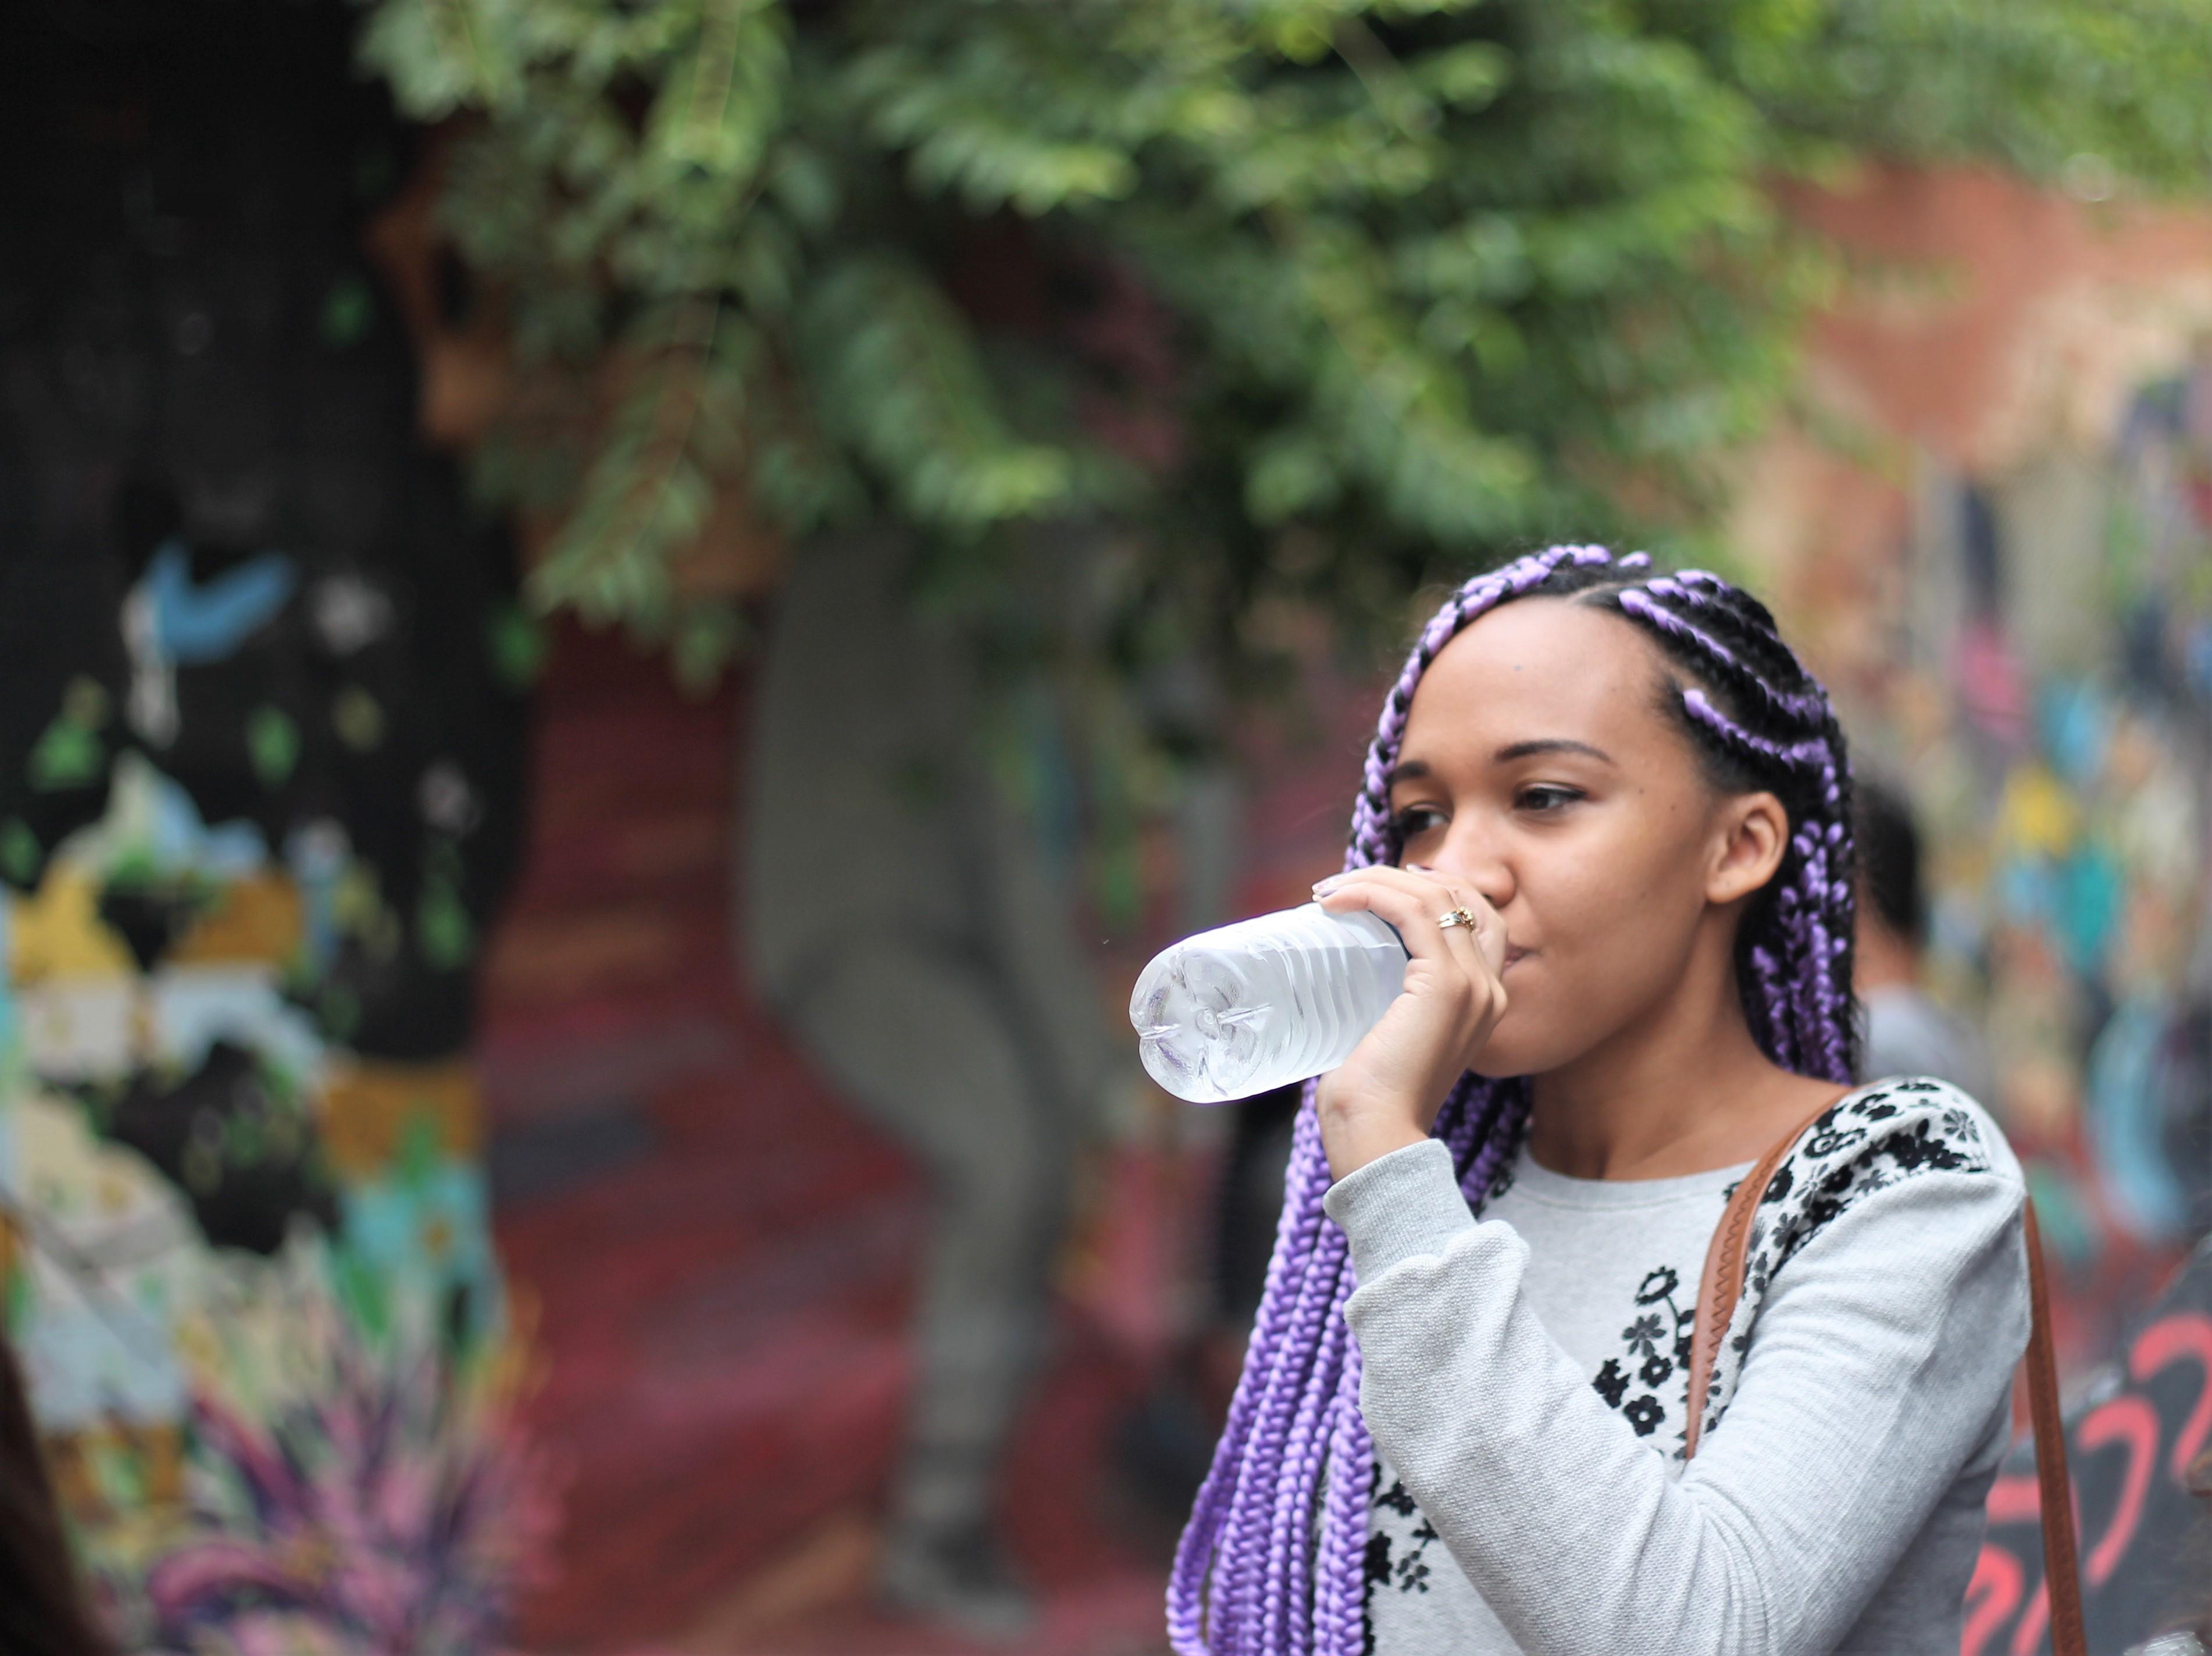 POC woman drinking water